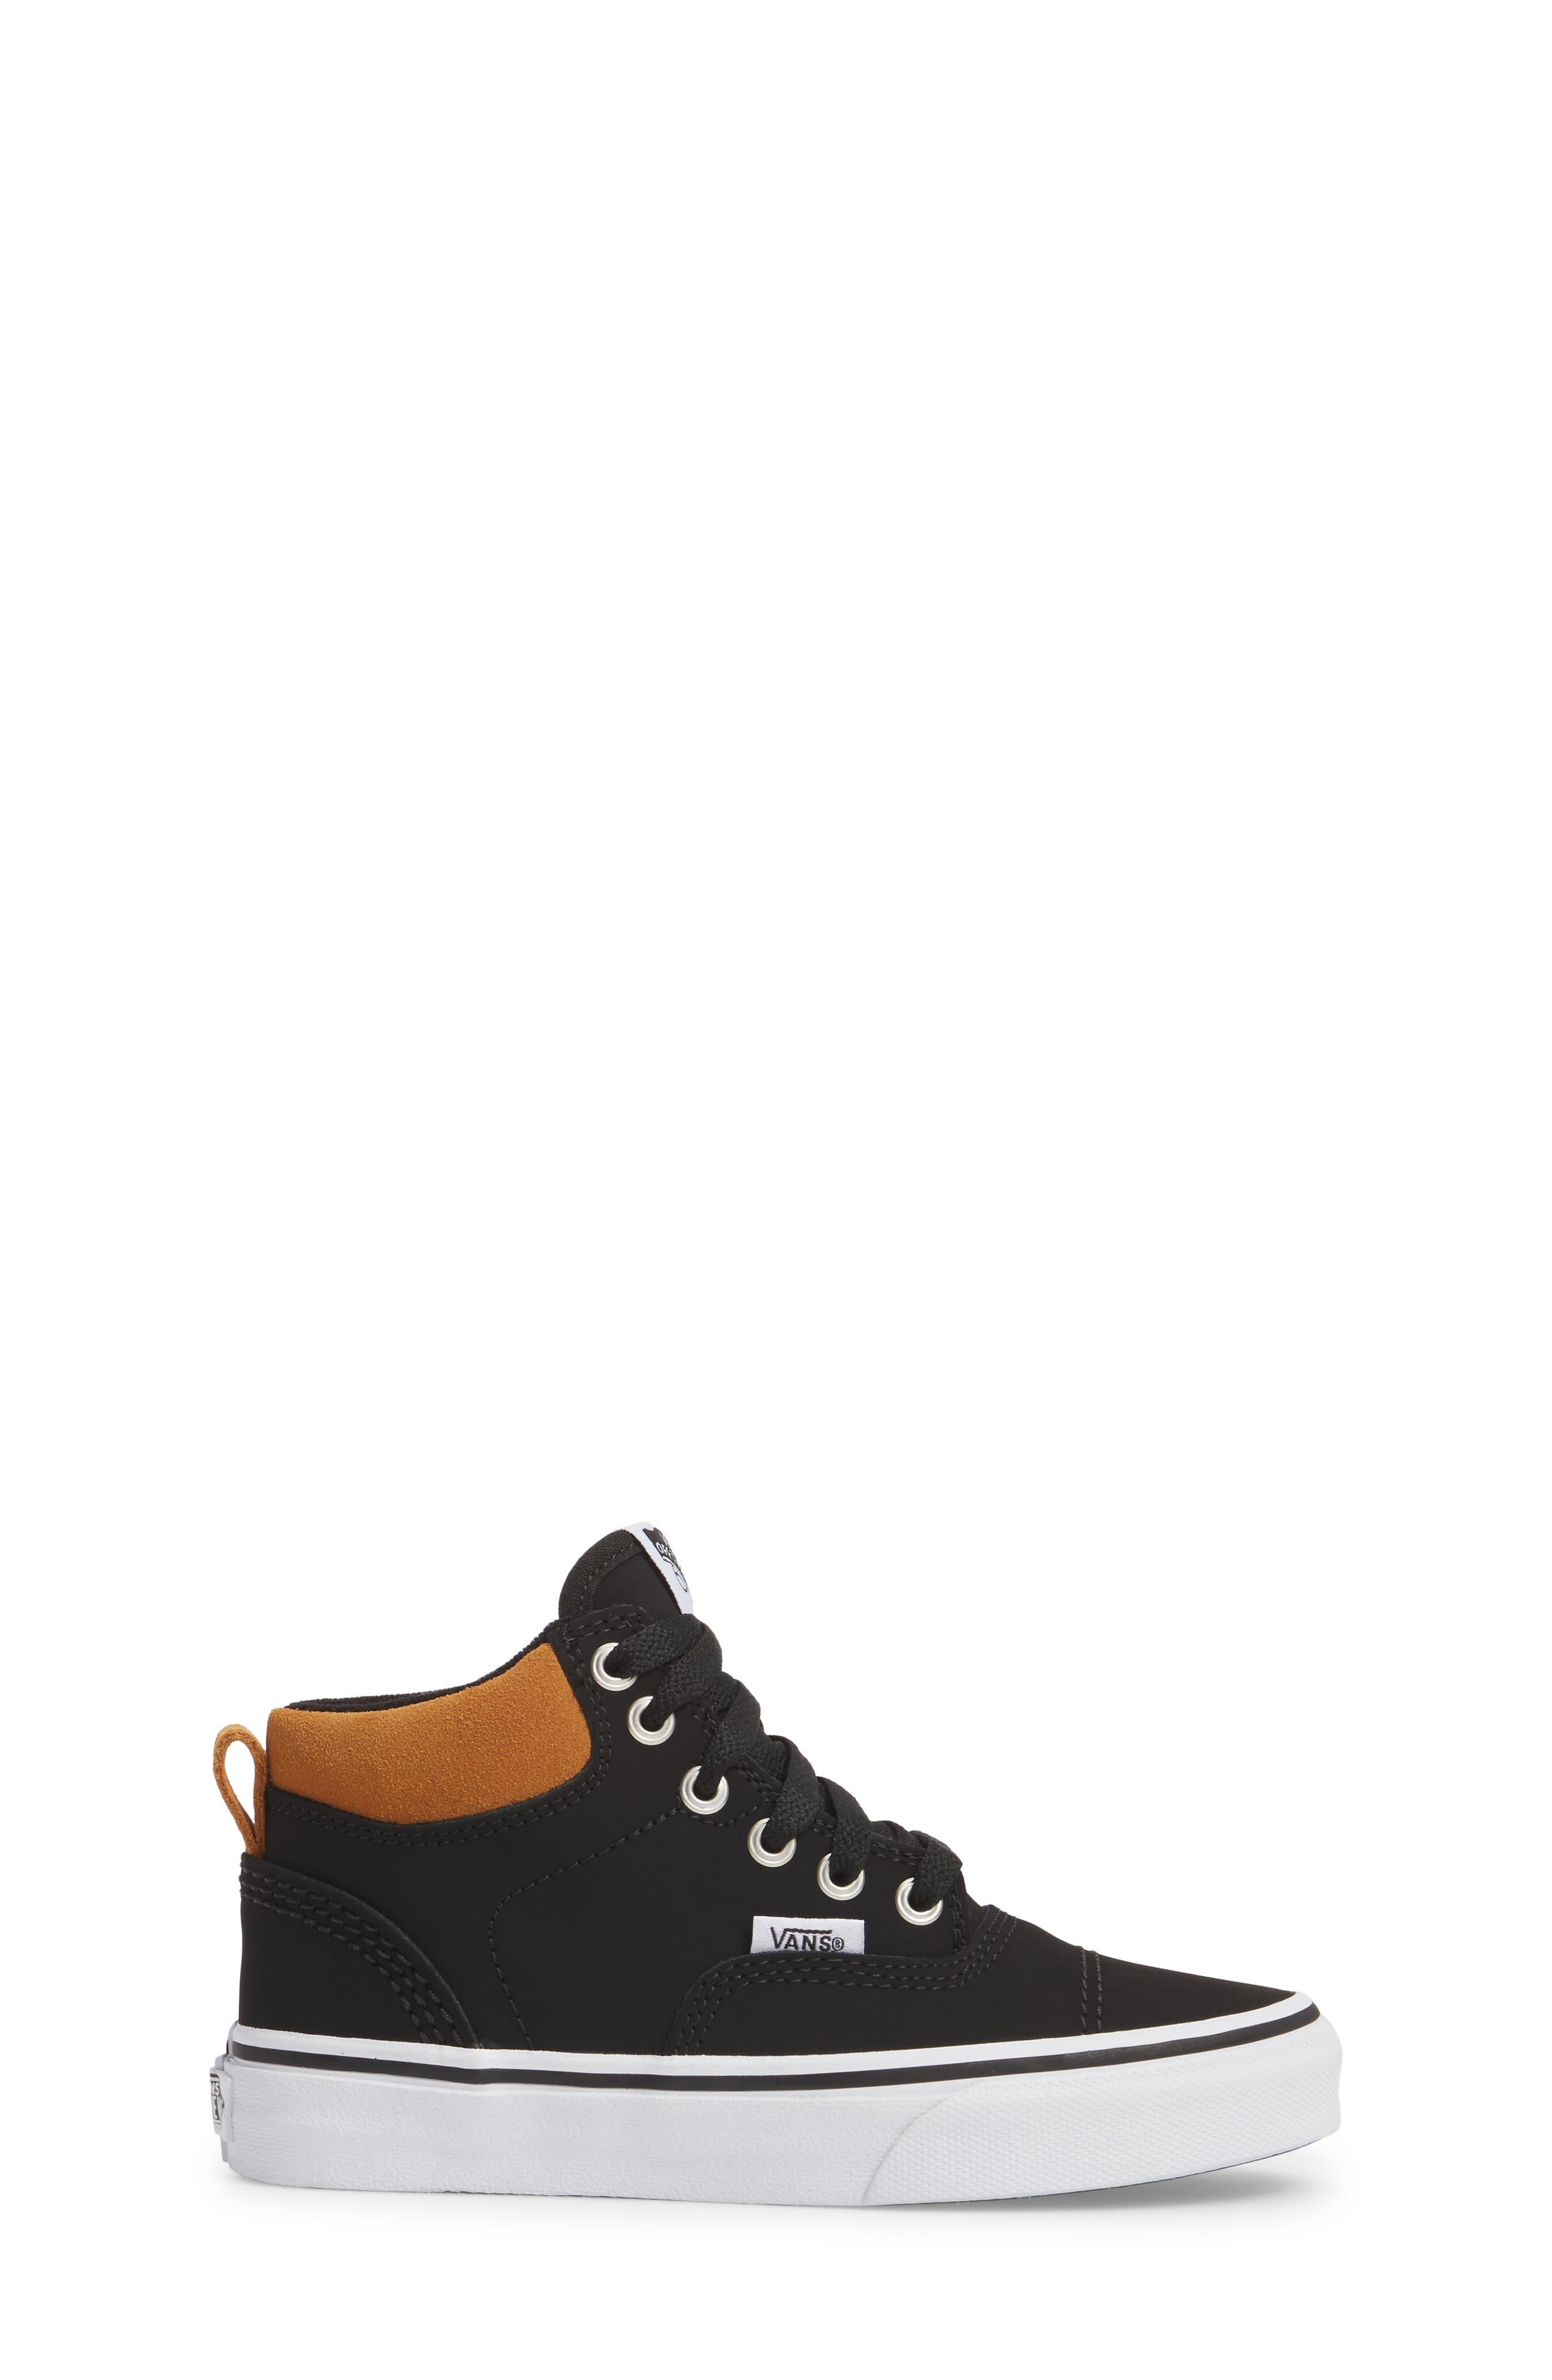 Era - Hi Sneaker,                             Alternate thumbnail 3, color,                             Vansbuck Black/ Cathay Spice